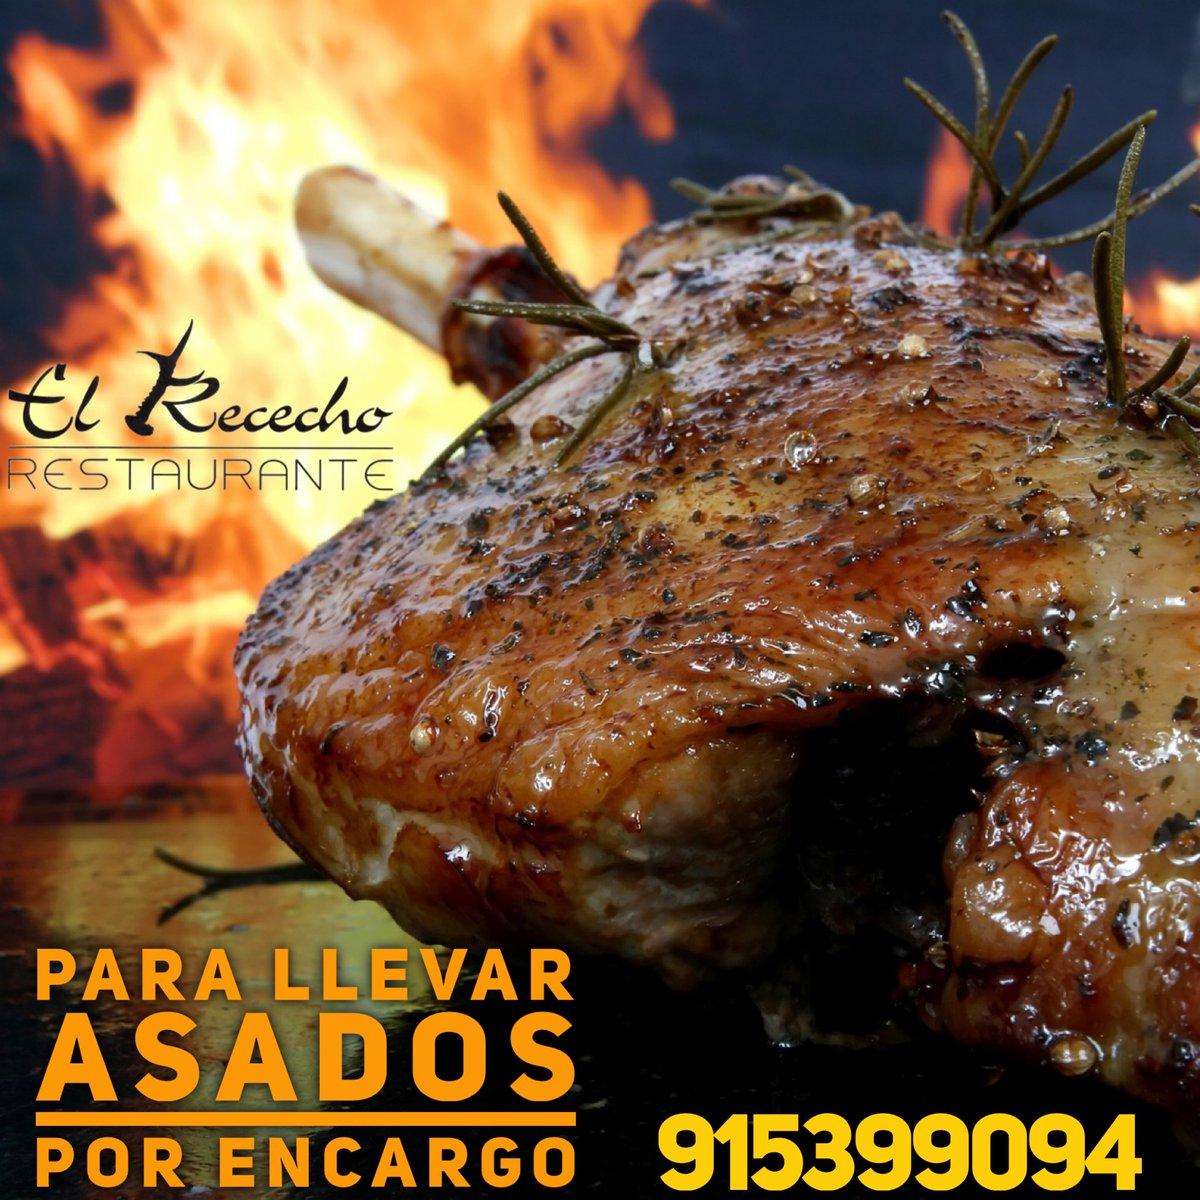 https://t.co/glZkCNOy0A Tel. 915 399 094 / 669 648 769  #alcorcon #elrececho #restaurantes #asados #porencargo #quecomerhoy https://t.co/aC5tmgaE9x